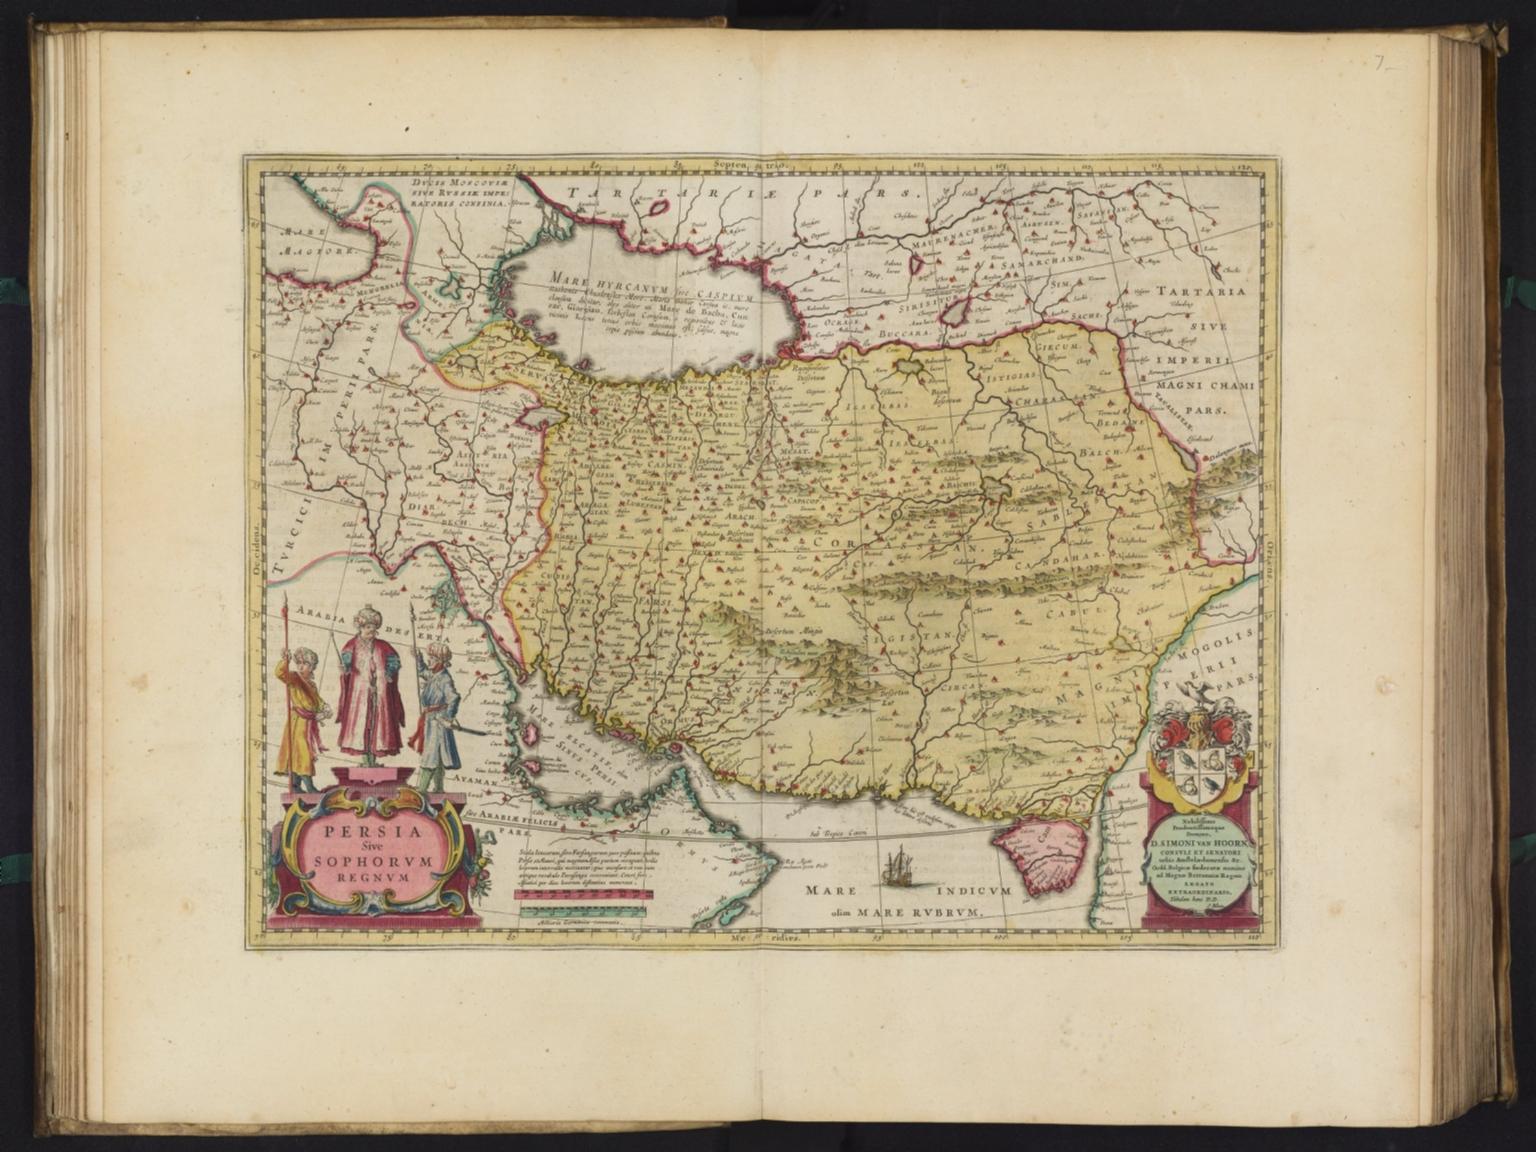 Persia, sive Sophorvm Regnvm